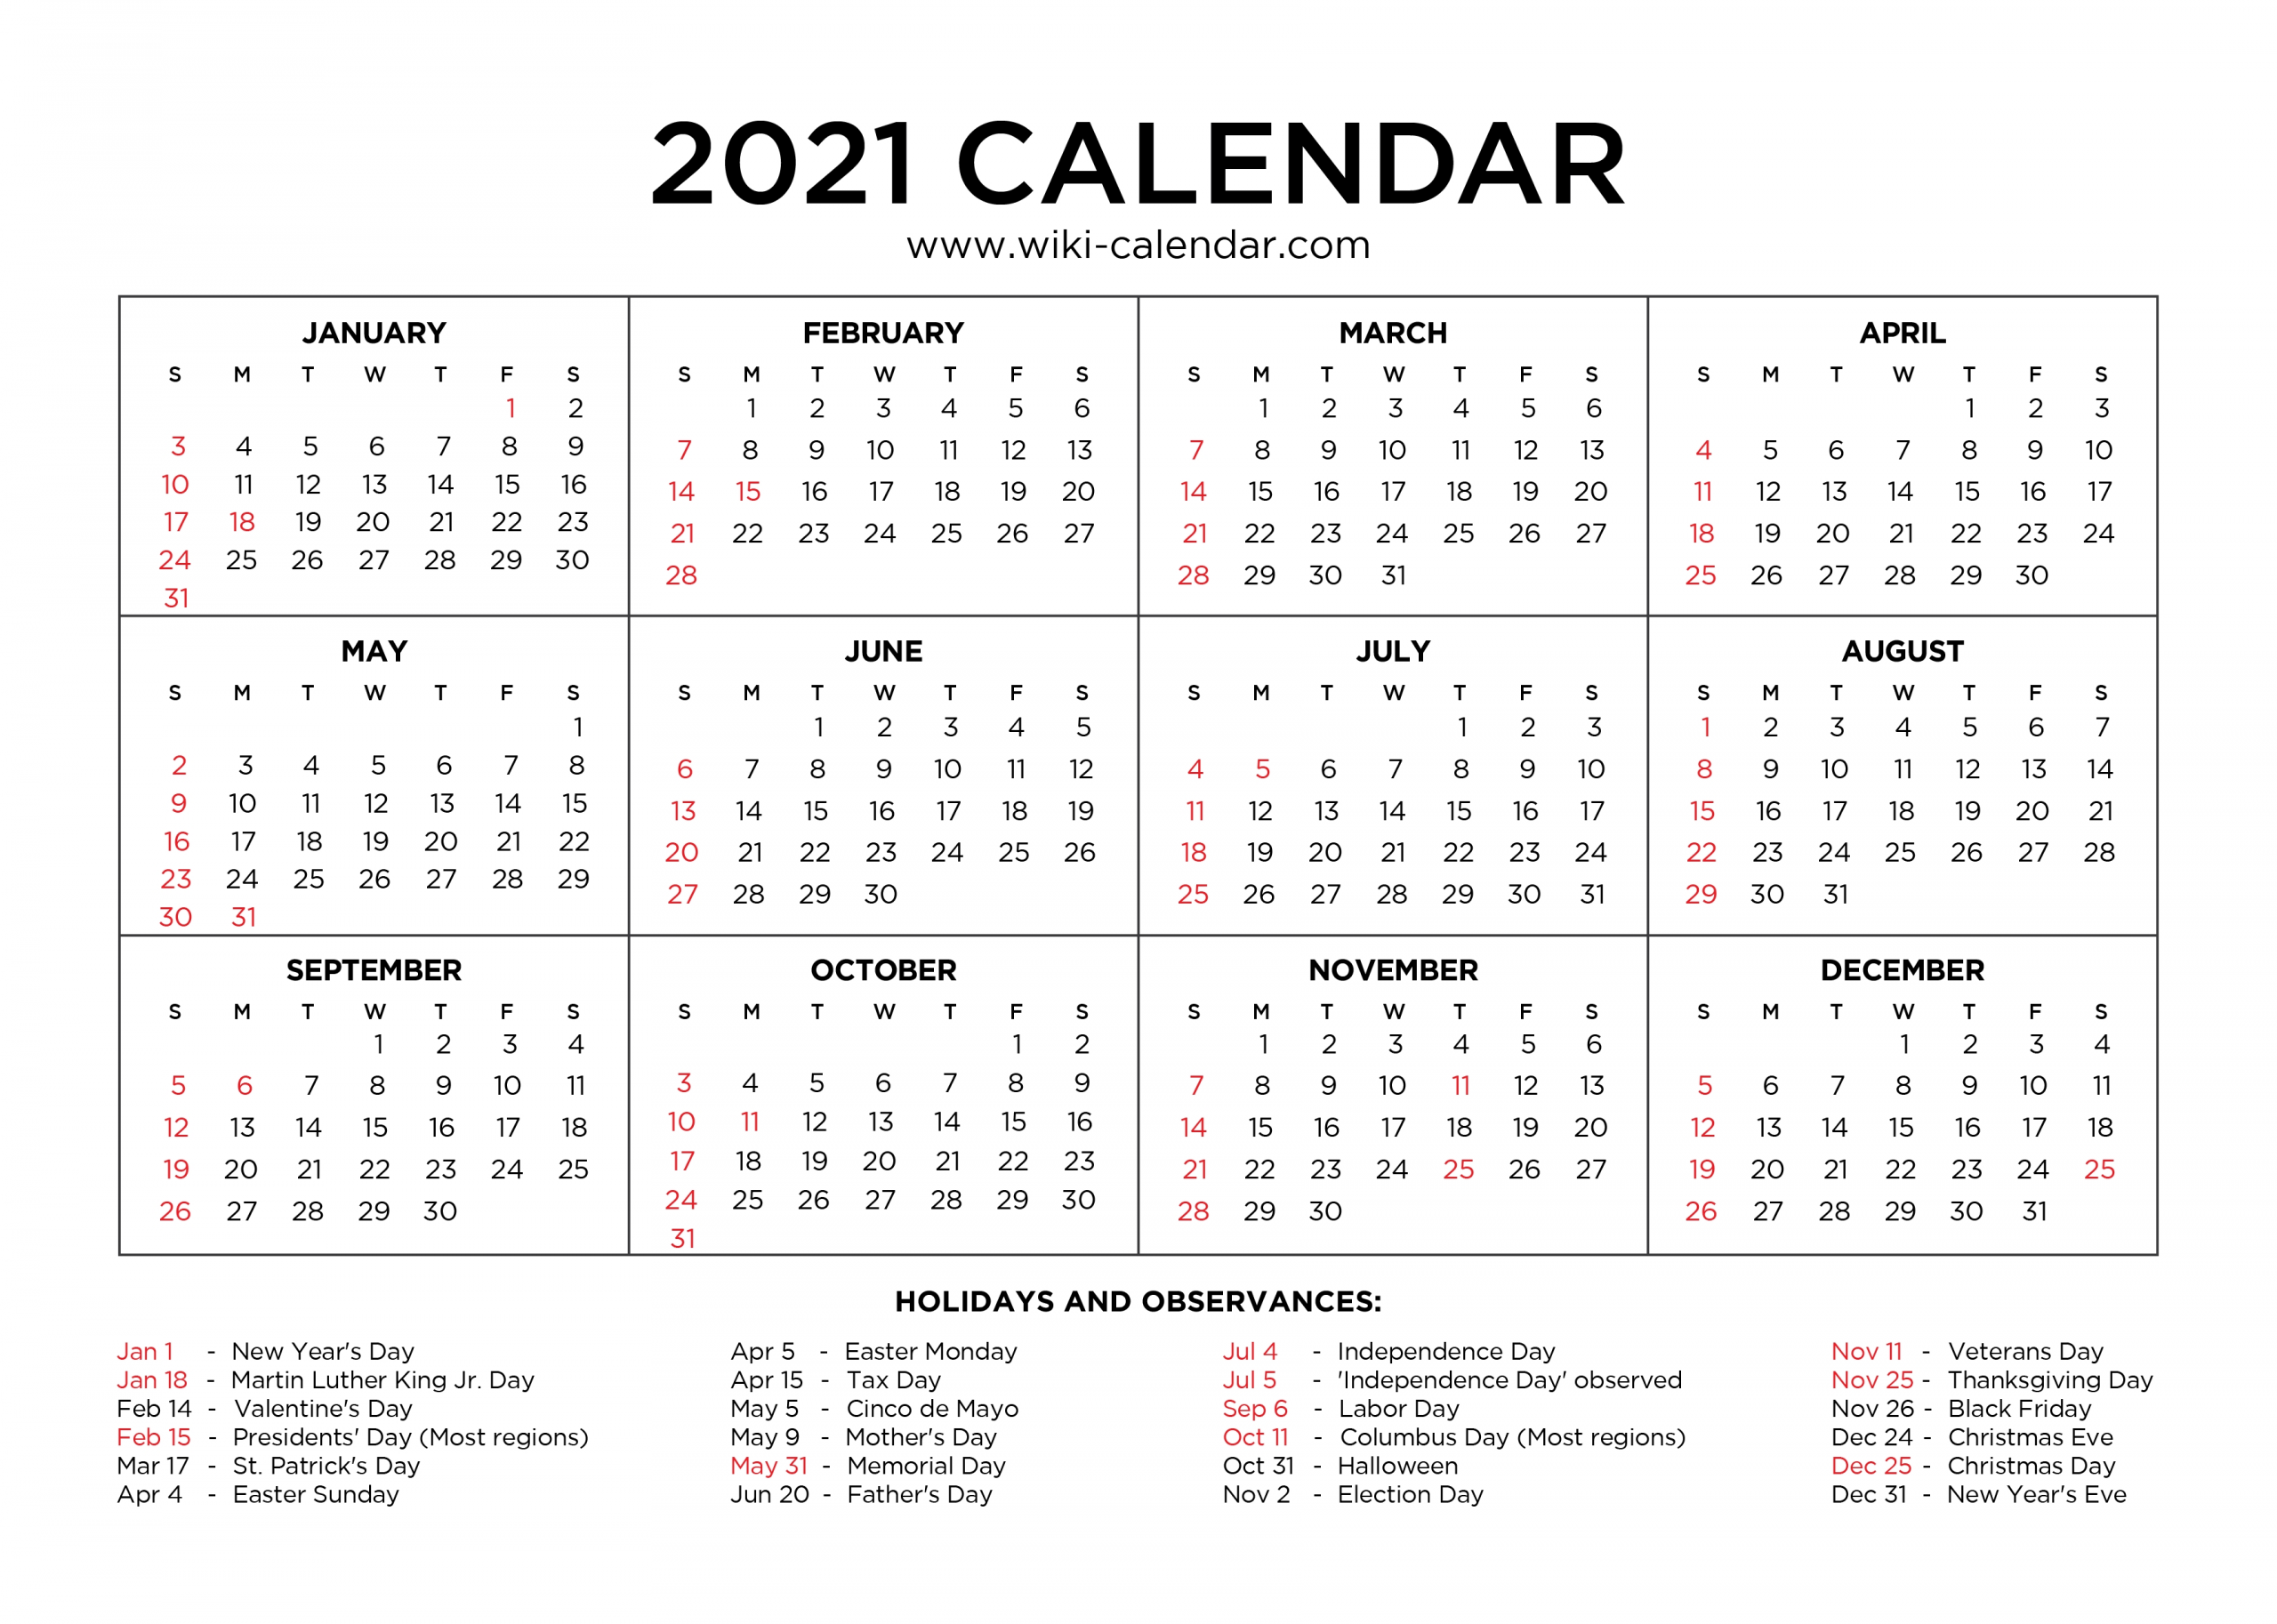 Free Printable Year 2021 Calendar With Holidays-2021 Calendar Printable